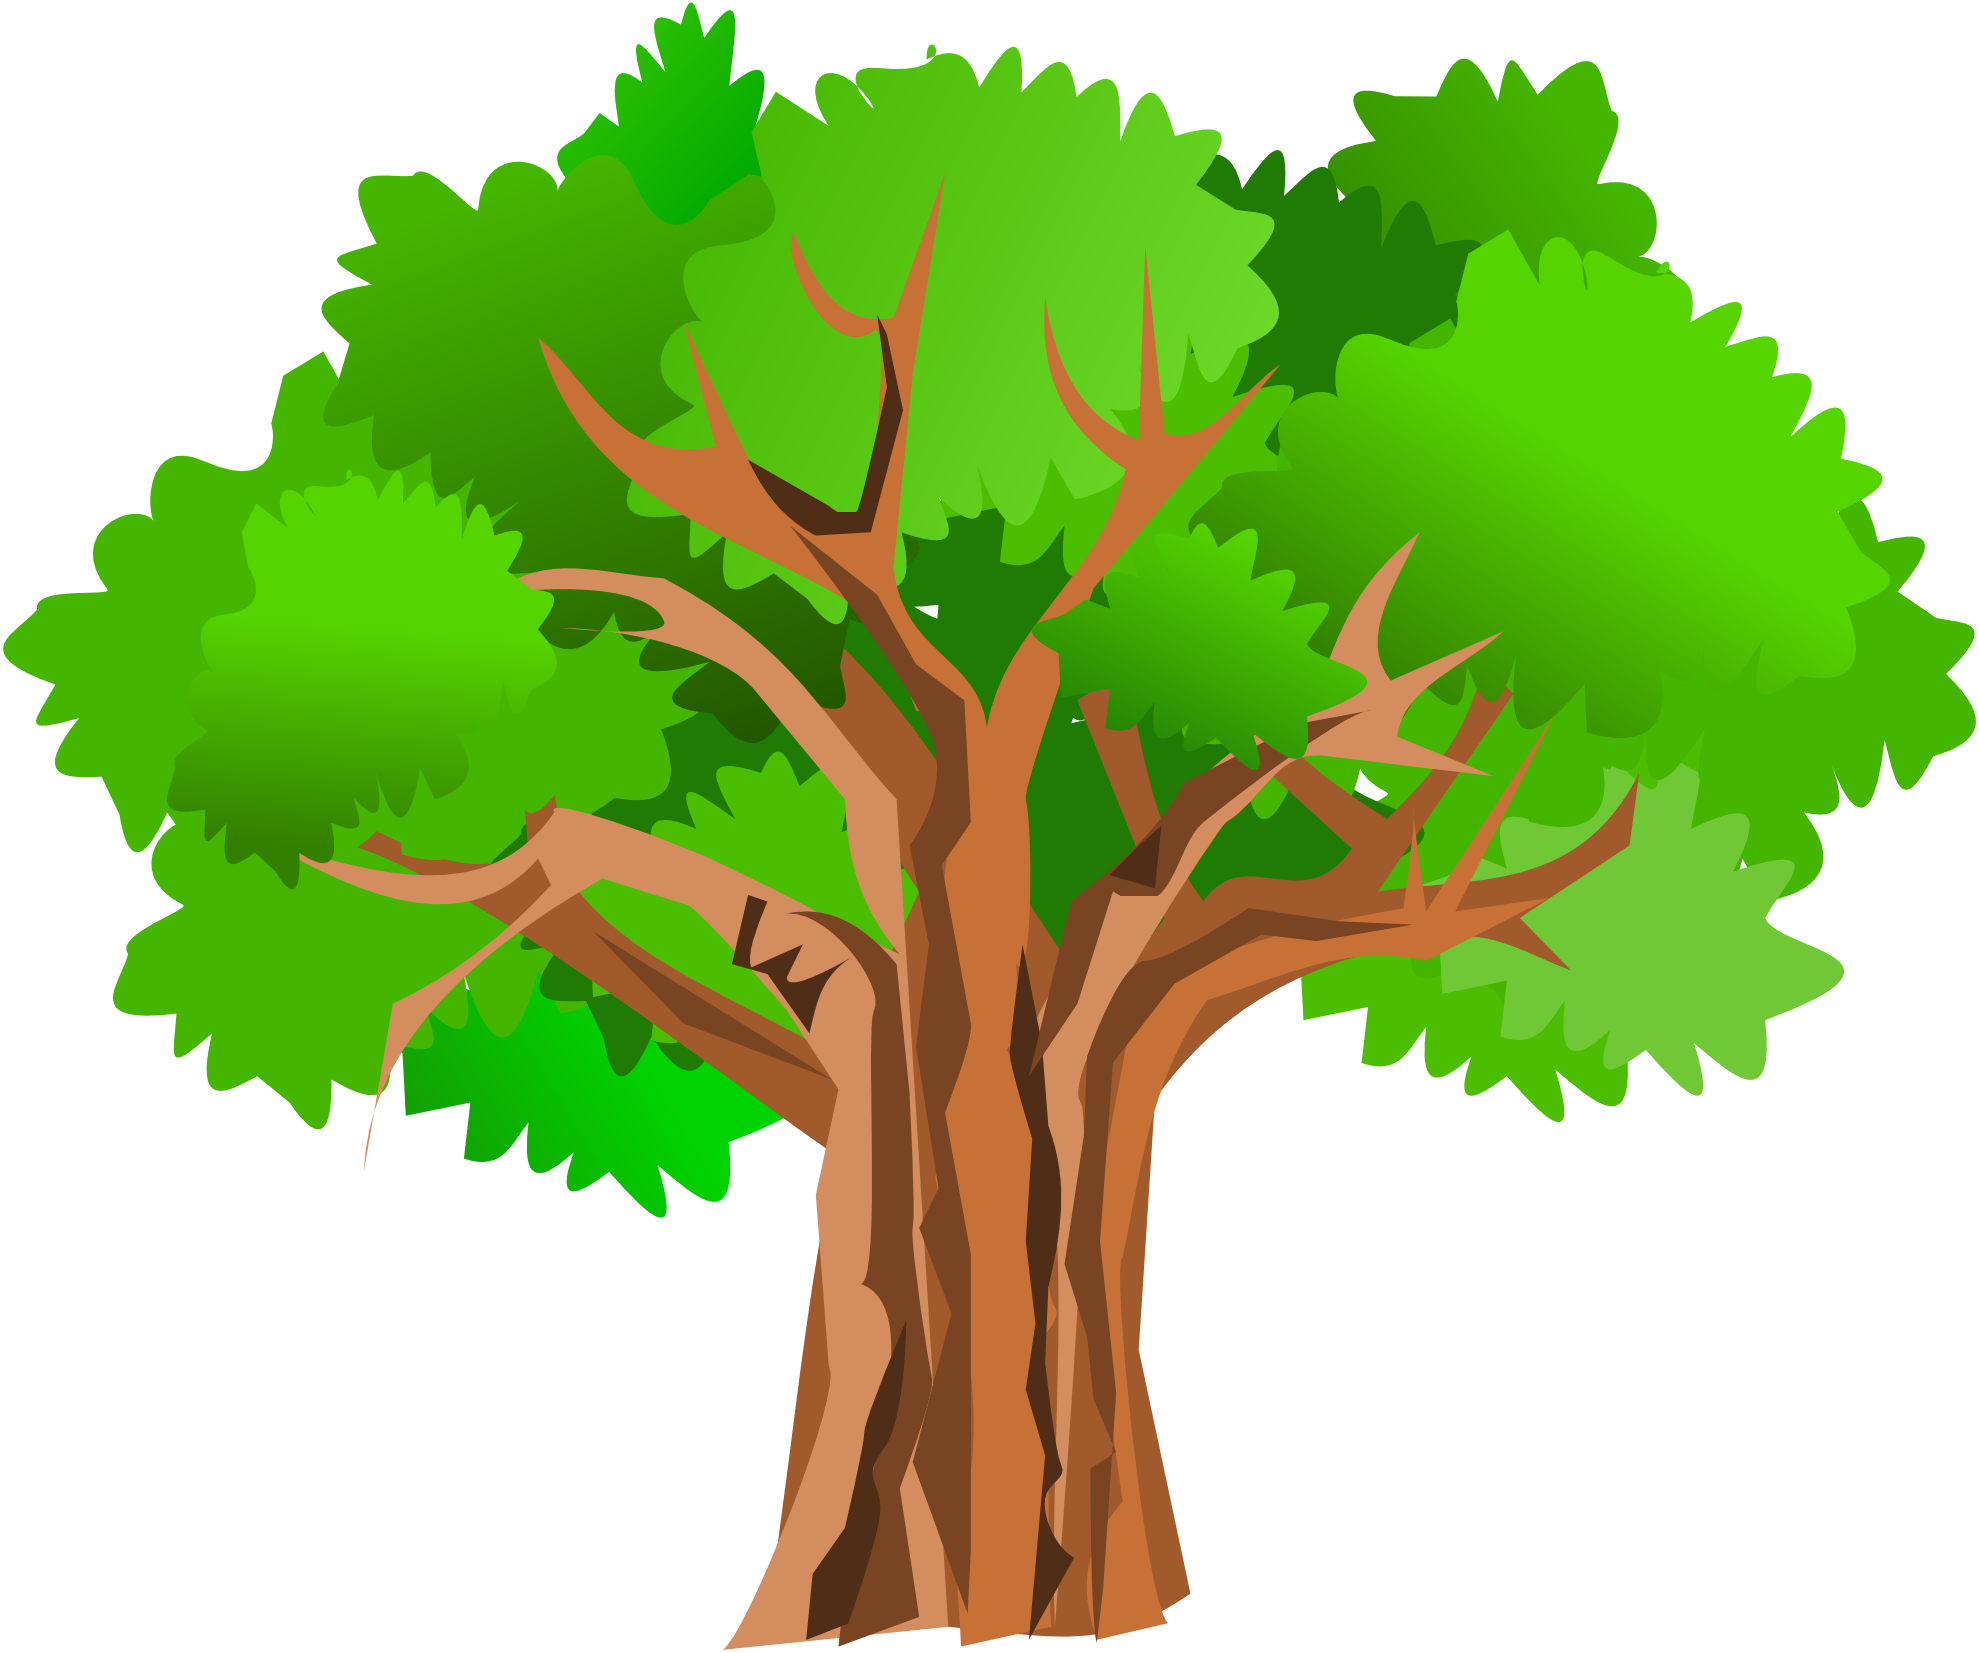 oak tree silhouette clip art free at getdrawings com free for rh getdrawings com dead oak tree clipart oak tree clip art images